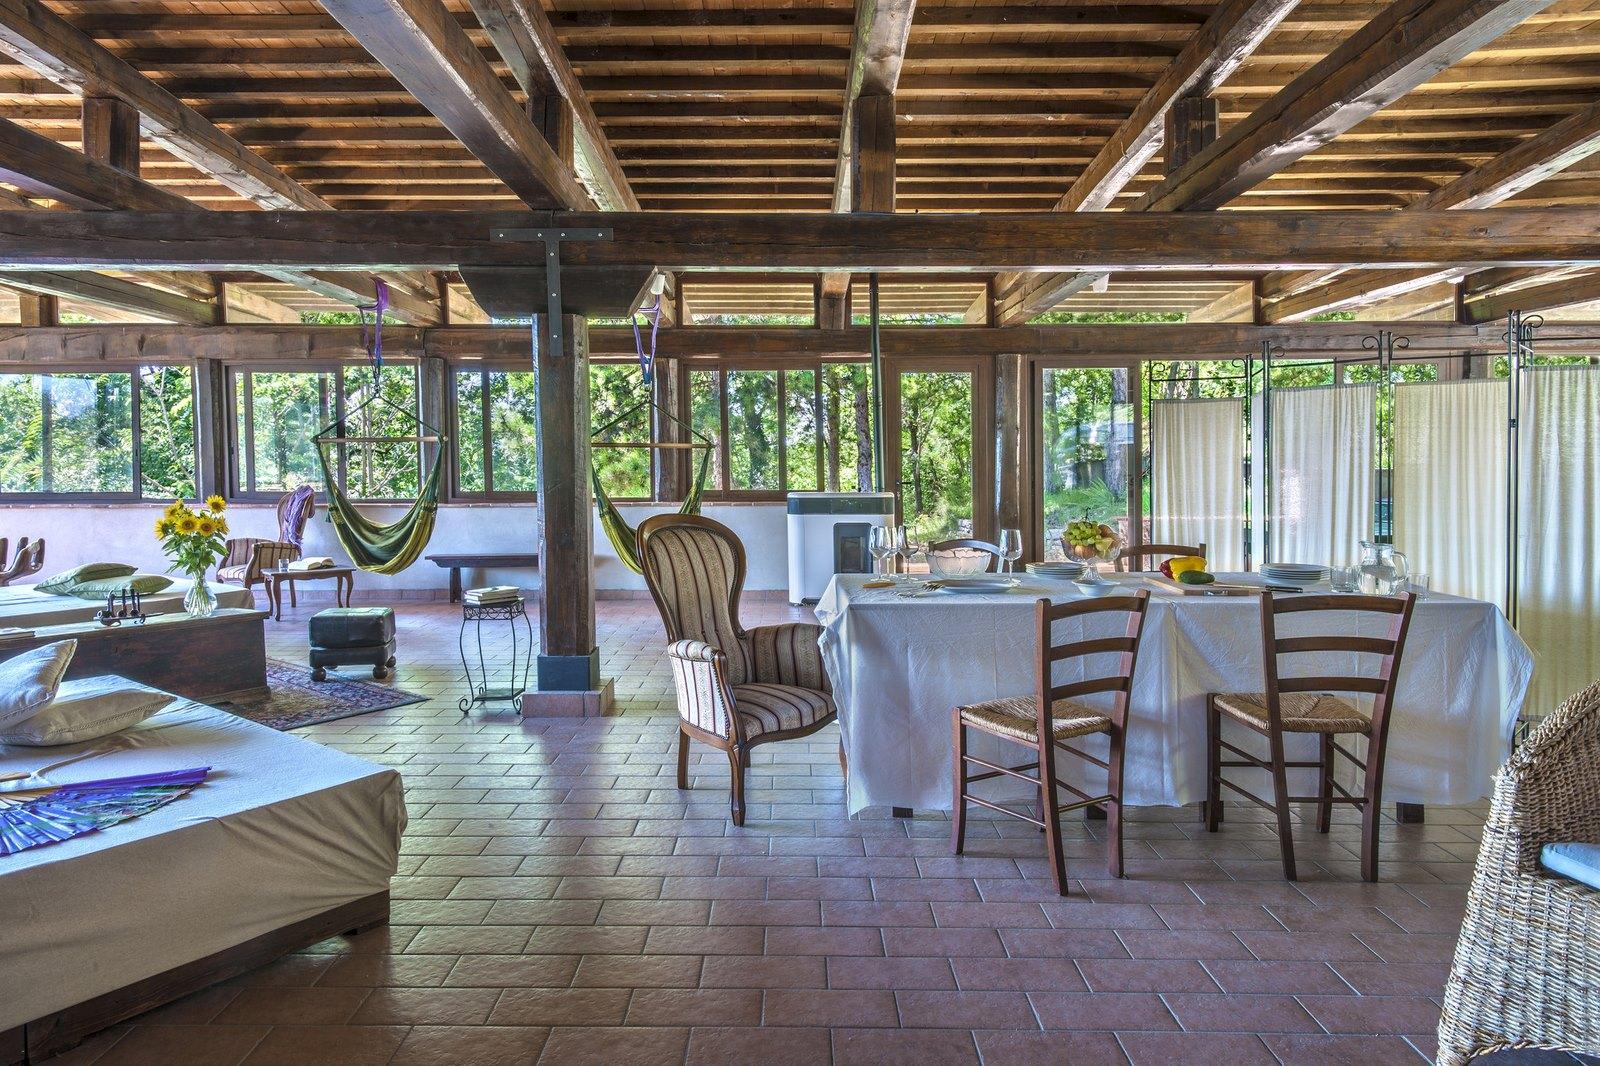 Ferienhaus La Quiete dei Re (2236092), Cagli, Pesaro und Urbino, Marken, Italien, Bild 18